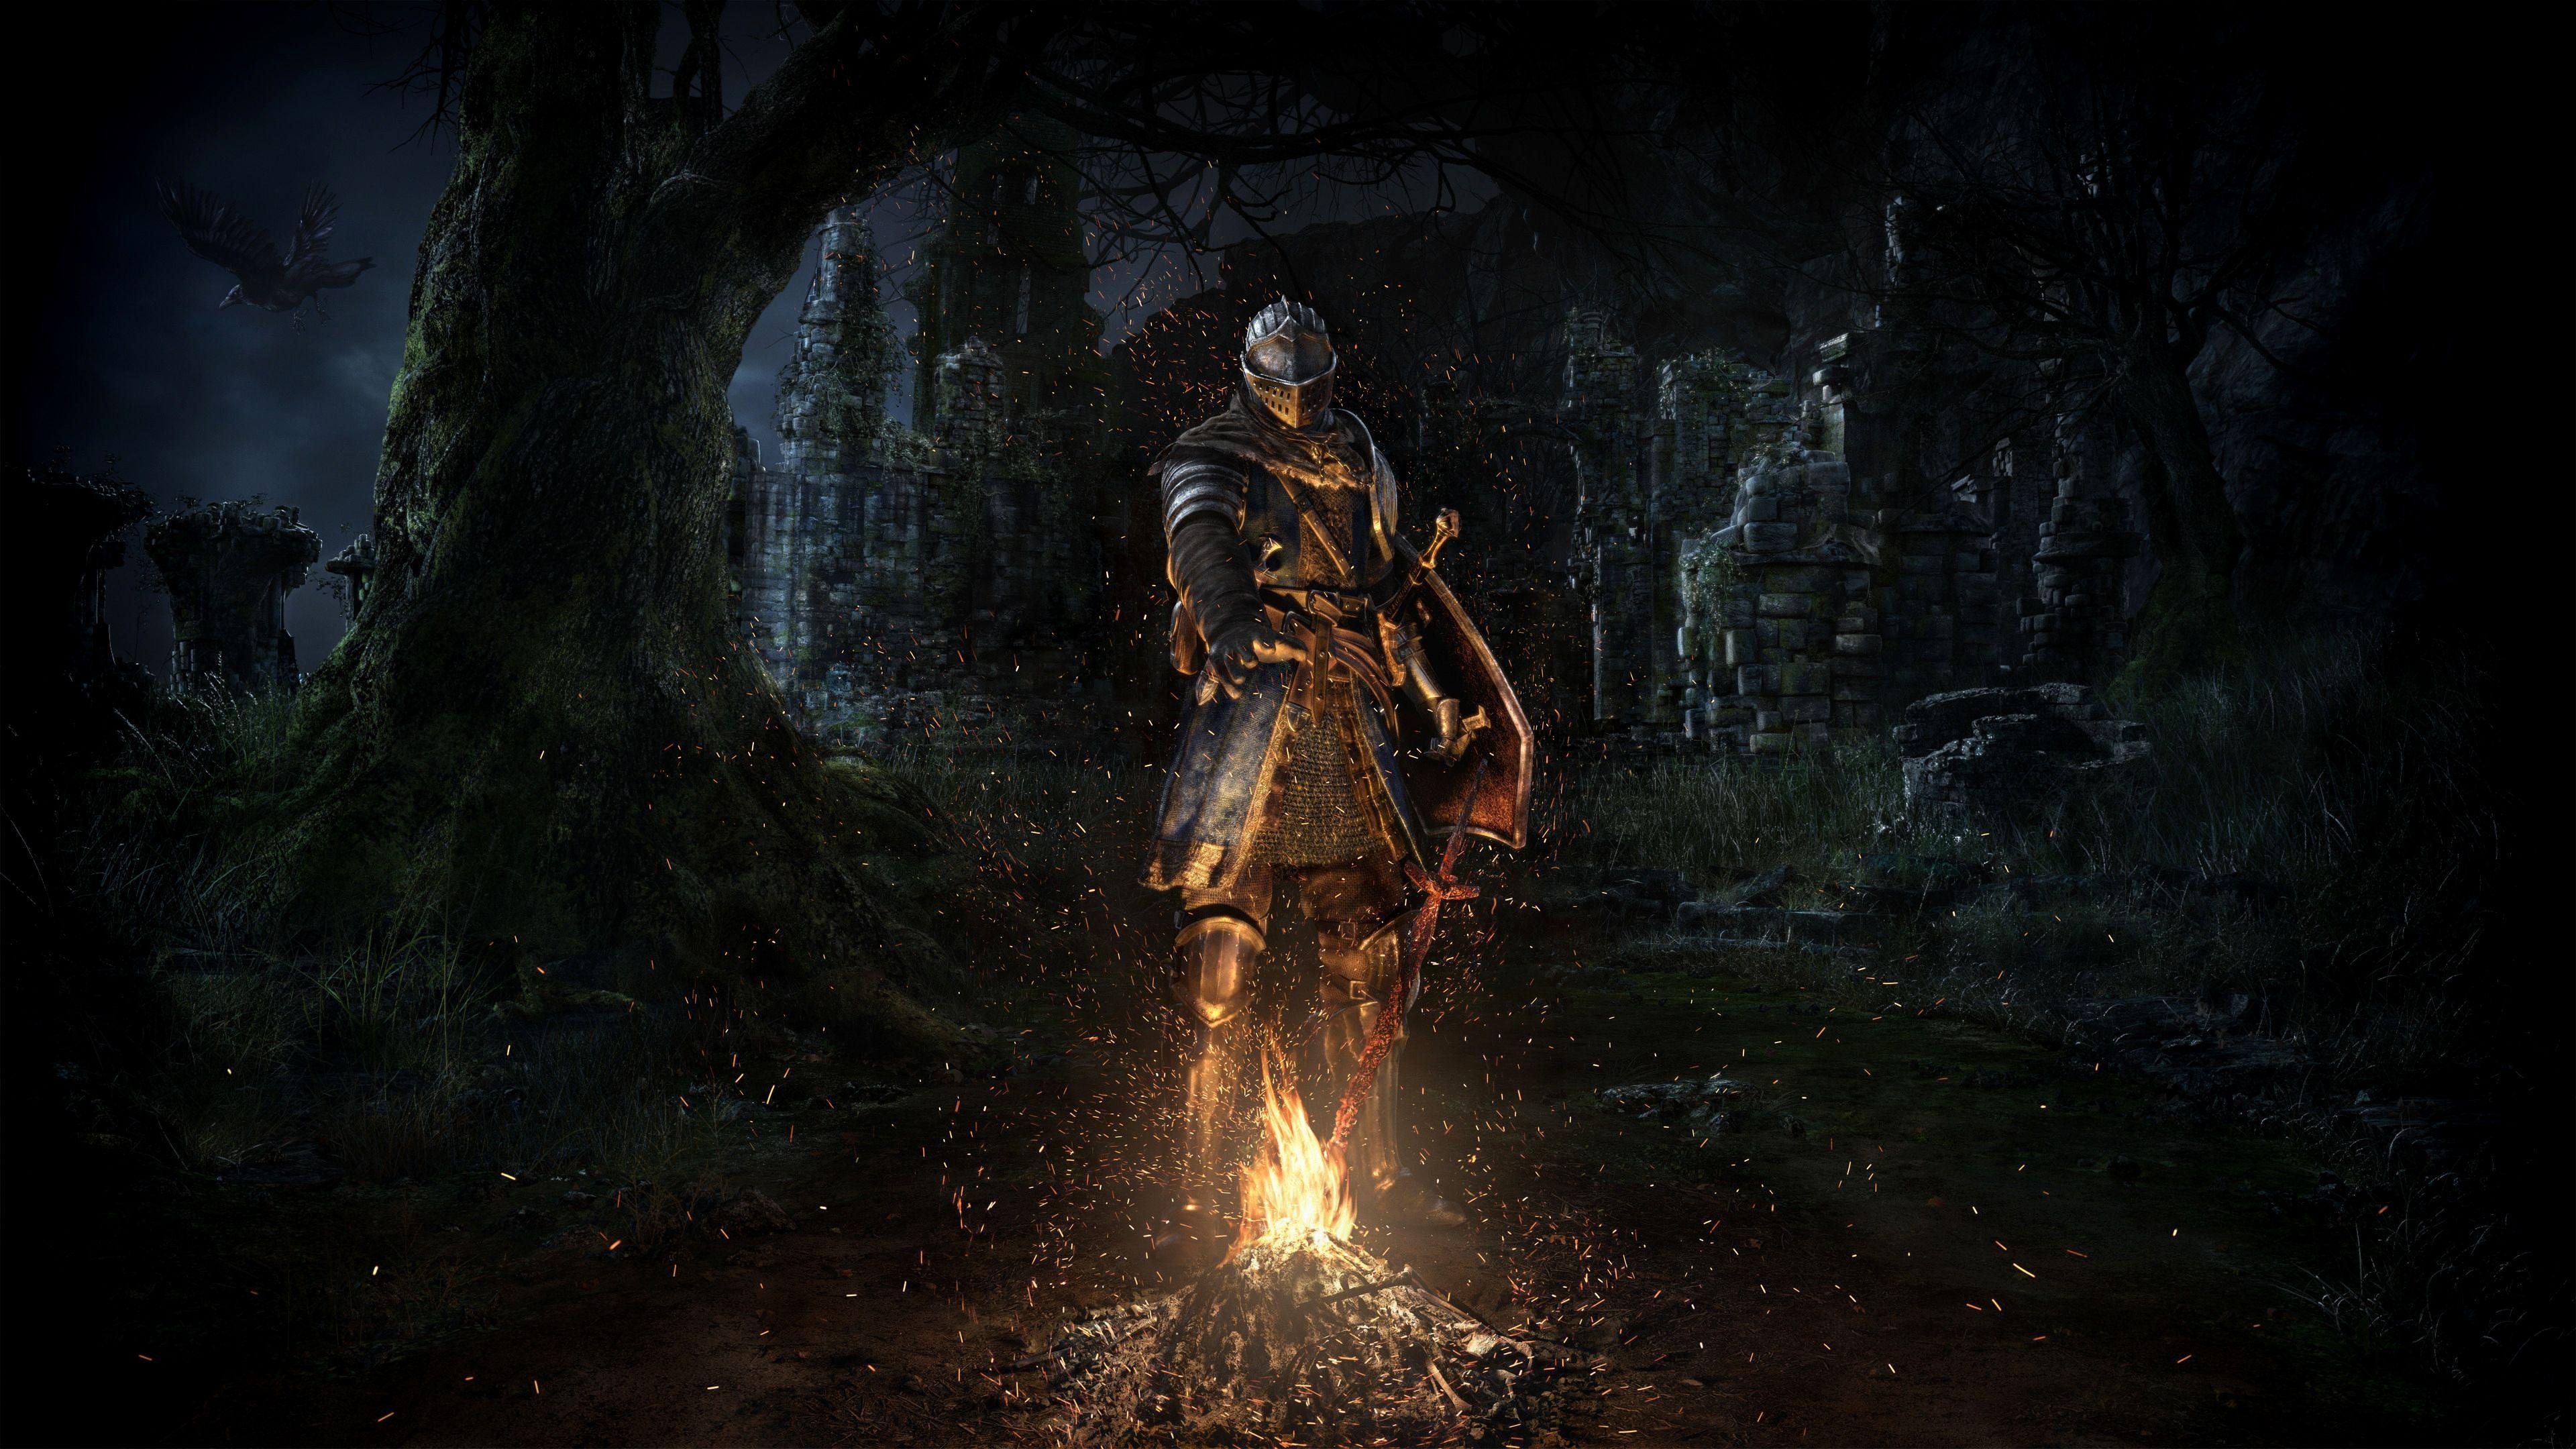 Dark Warrior 4k Wallpaper Gallery In 2020 Dark Souls Dark Wallpaper Hd Wallpapers 1080p